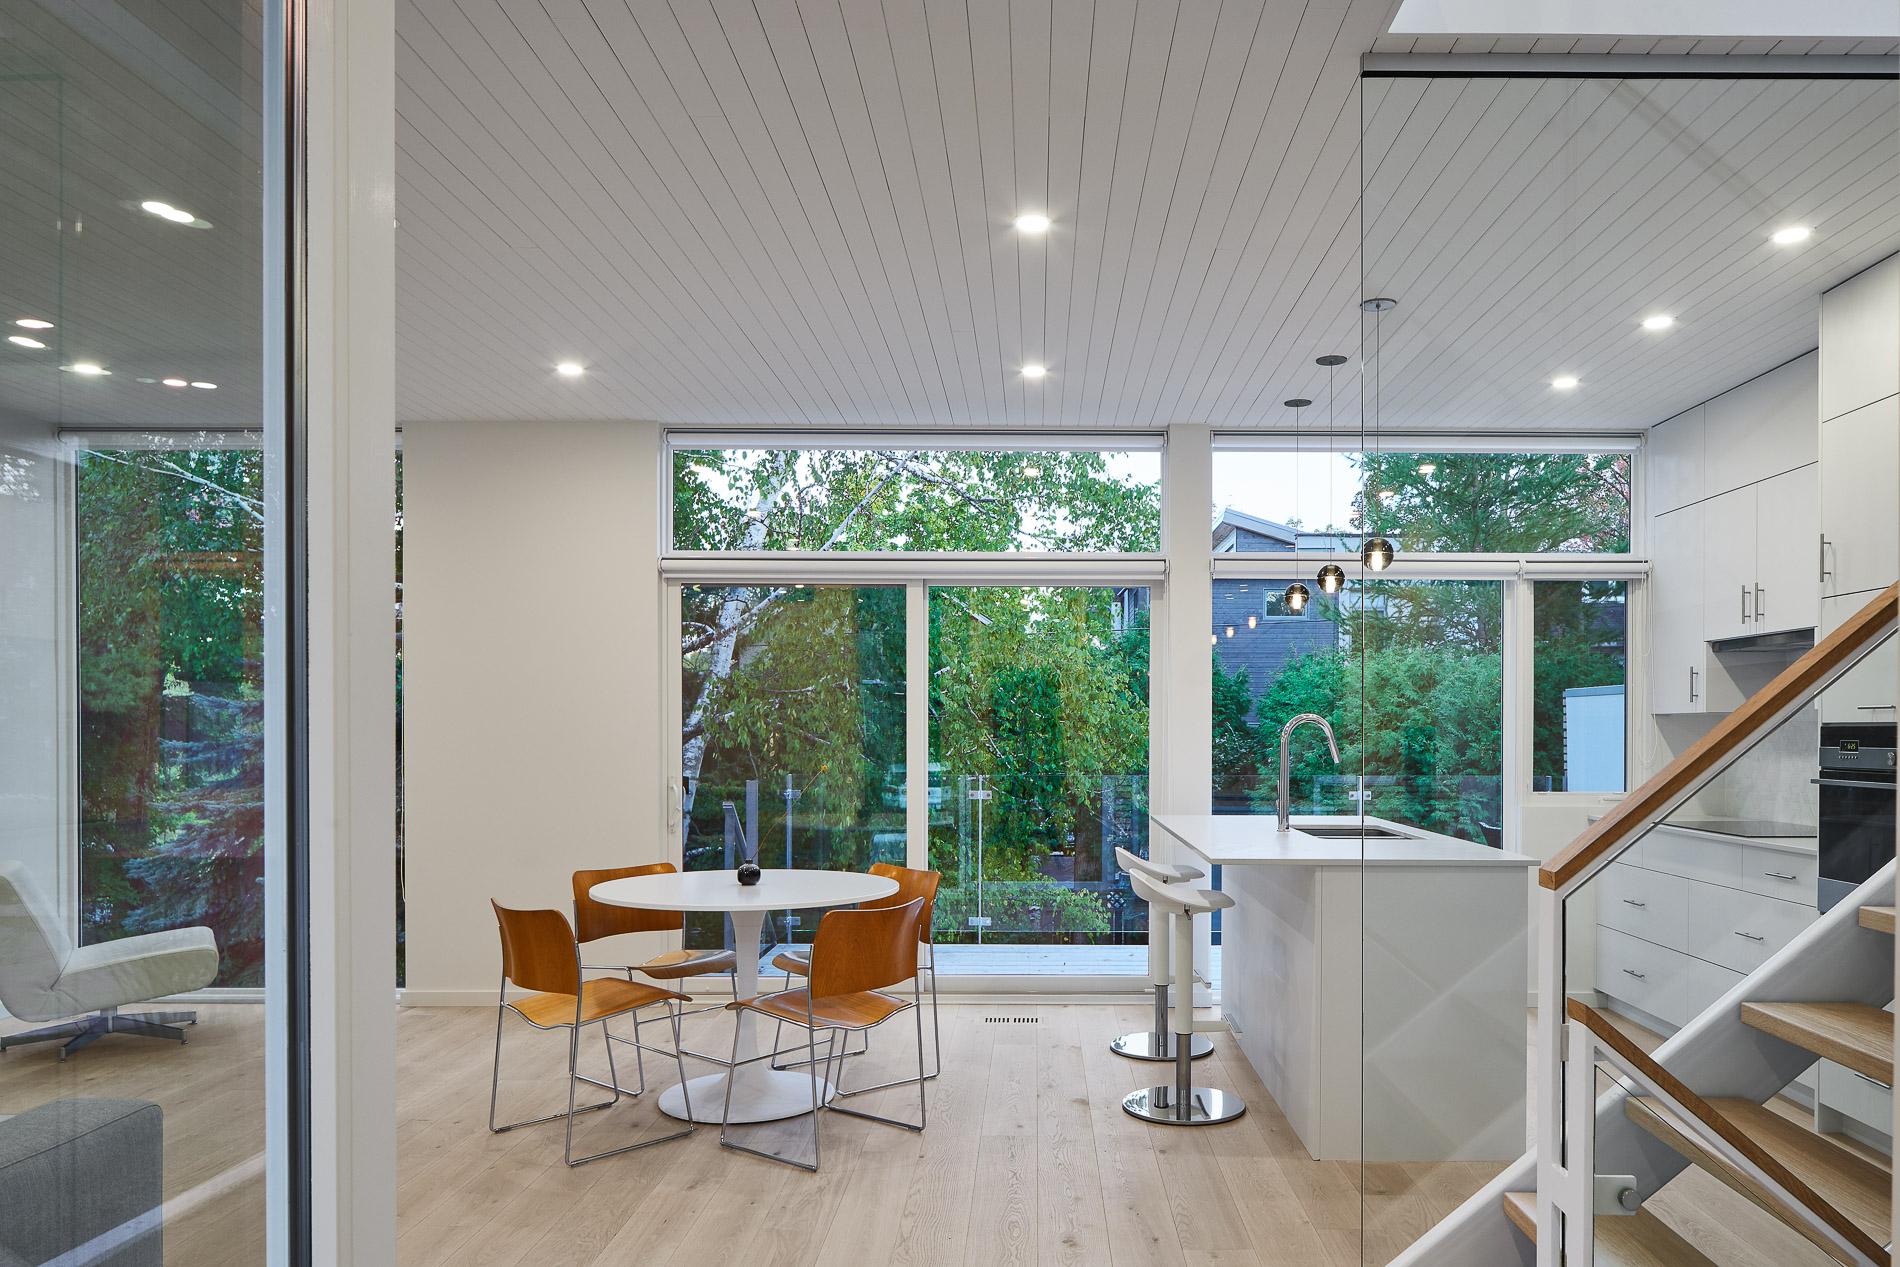 043-Shean Architects Fentiman.jpg